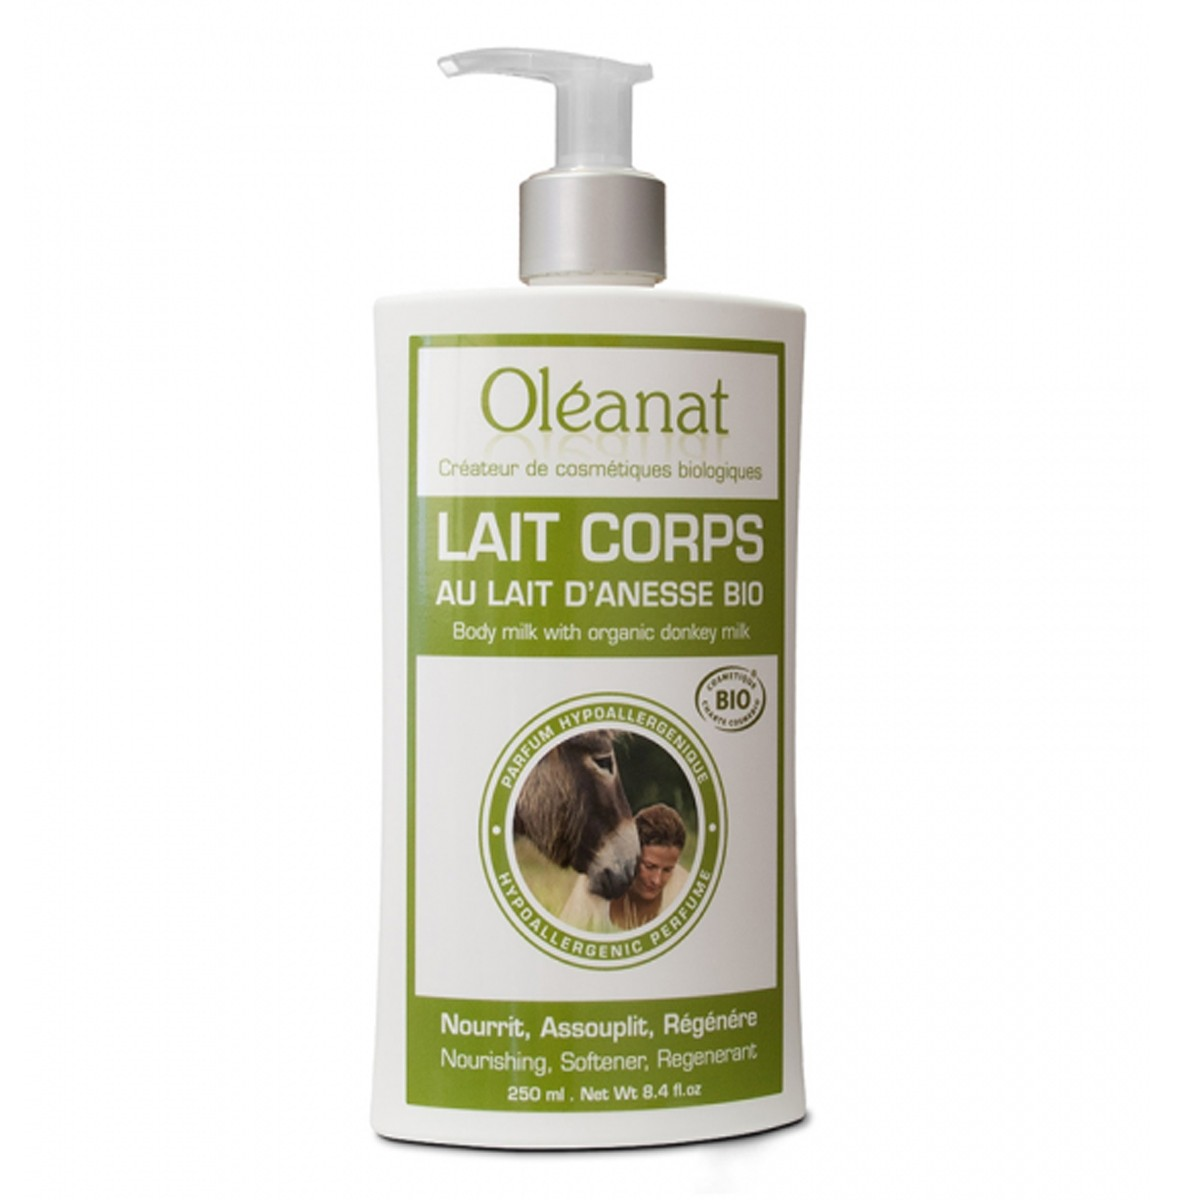 Oléanat Organic Hypoallergenic Donkey Body Milk